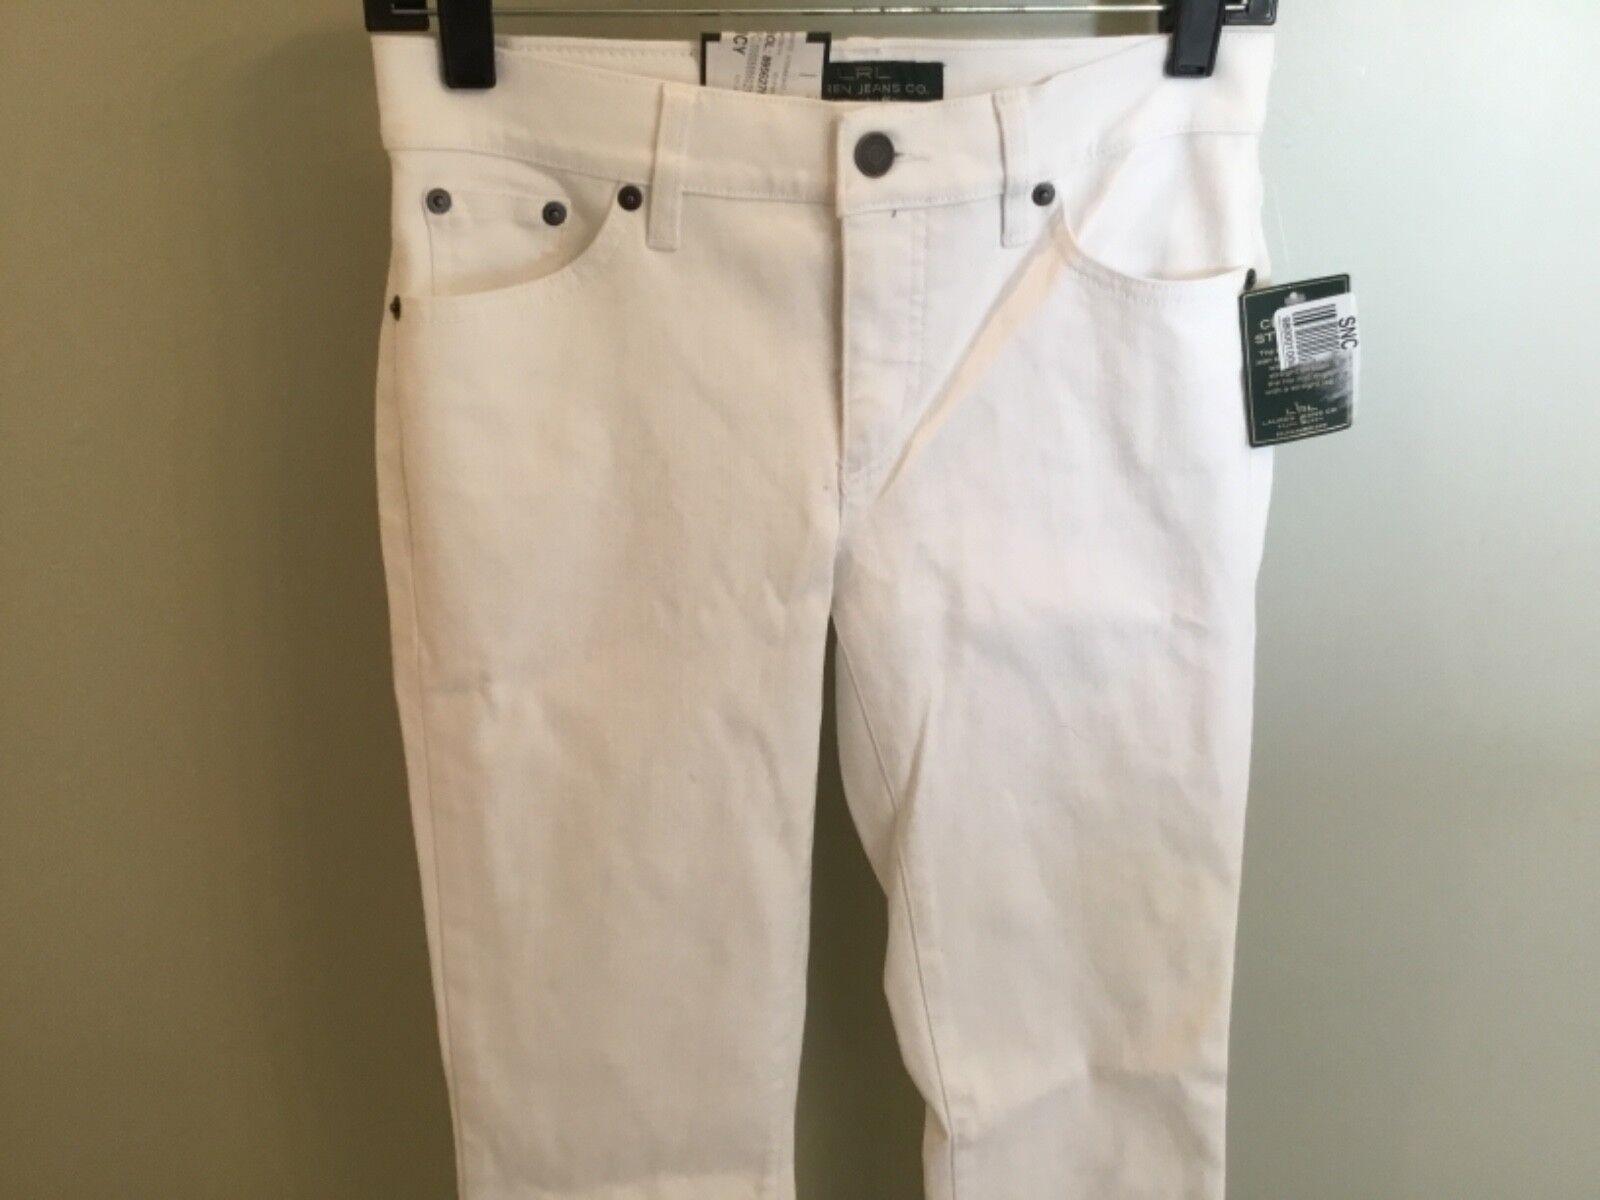 Ralph Lauren White Denim Jeans New 2P Petite Women's Pants Stretch Slimming Fit